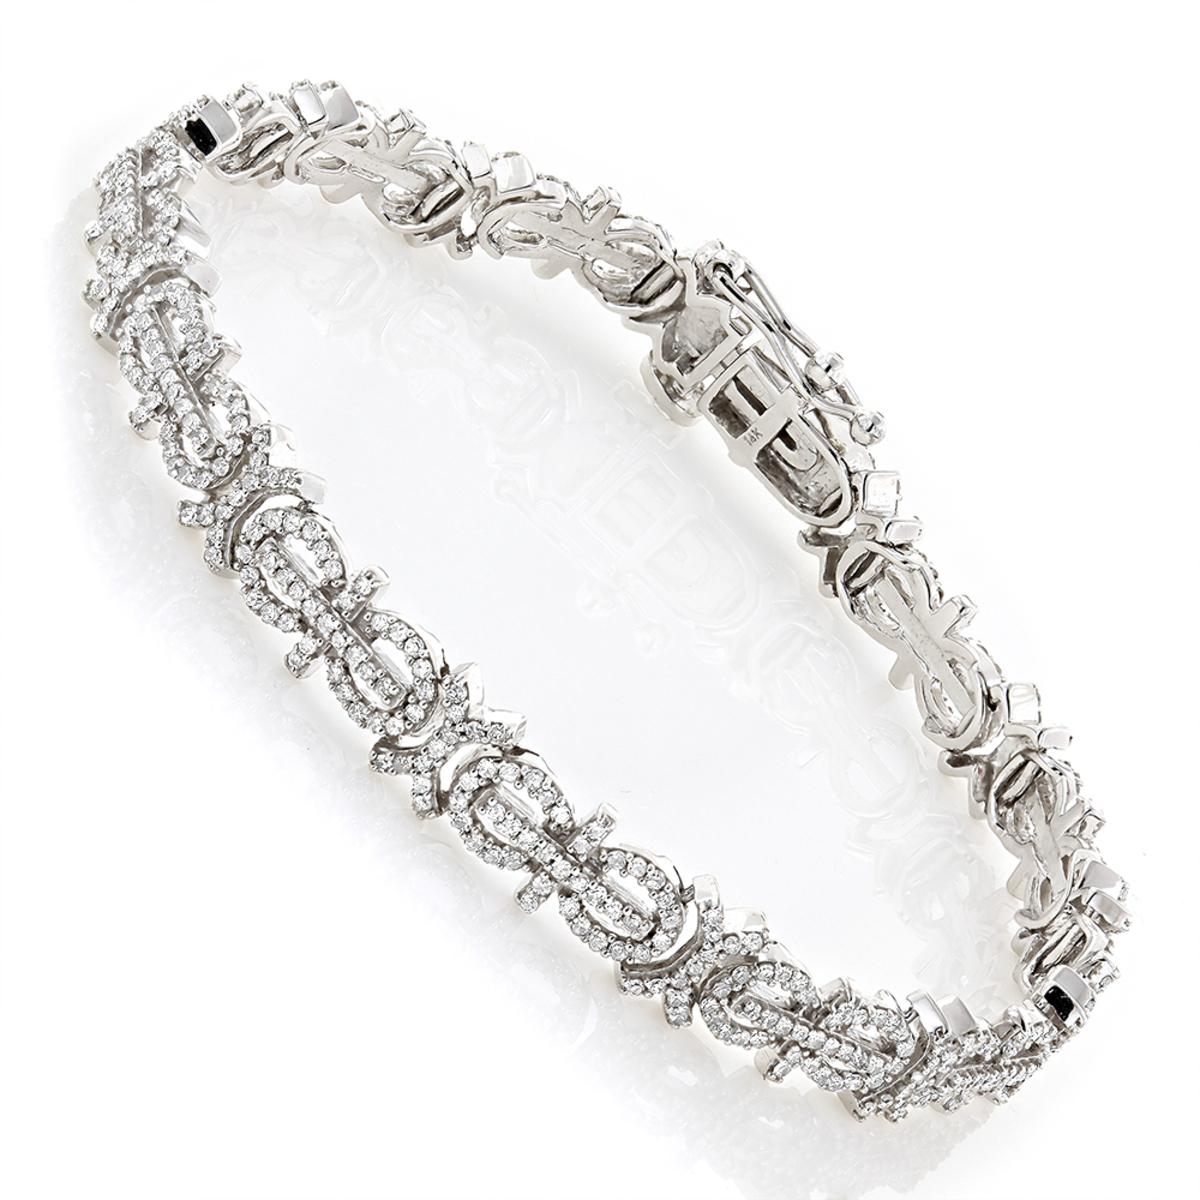 14K Gold Ladies Pave Diamond Bracelet 2.27ct